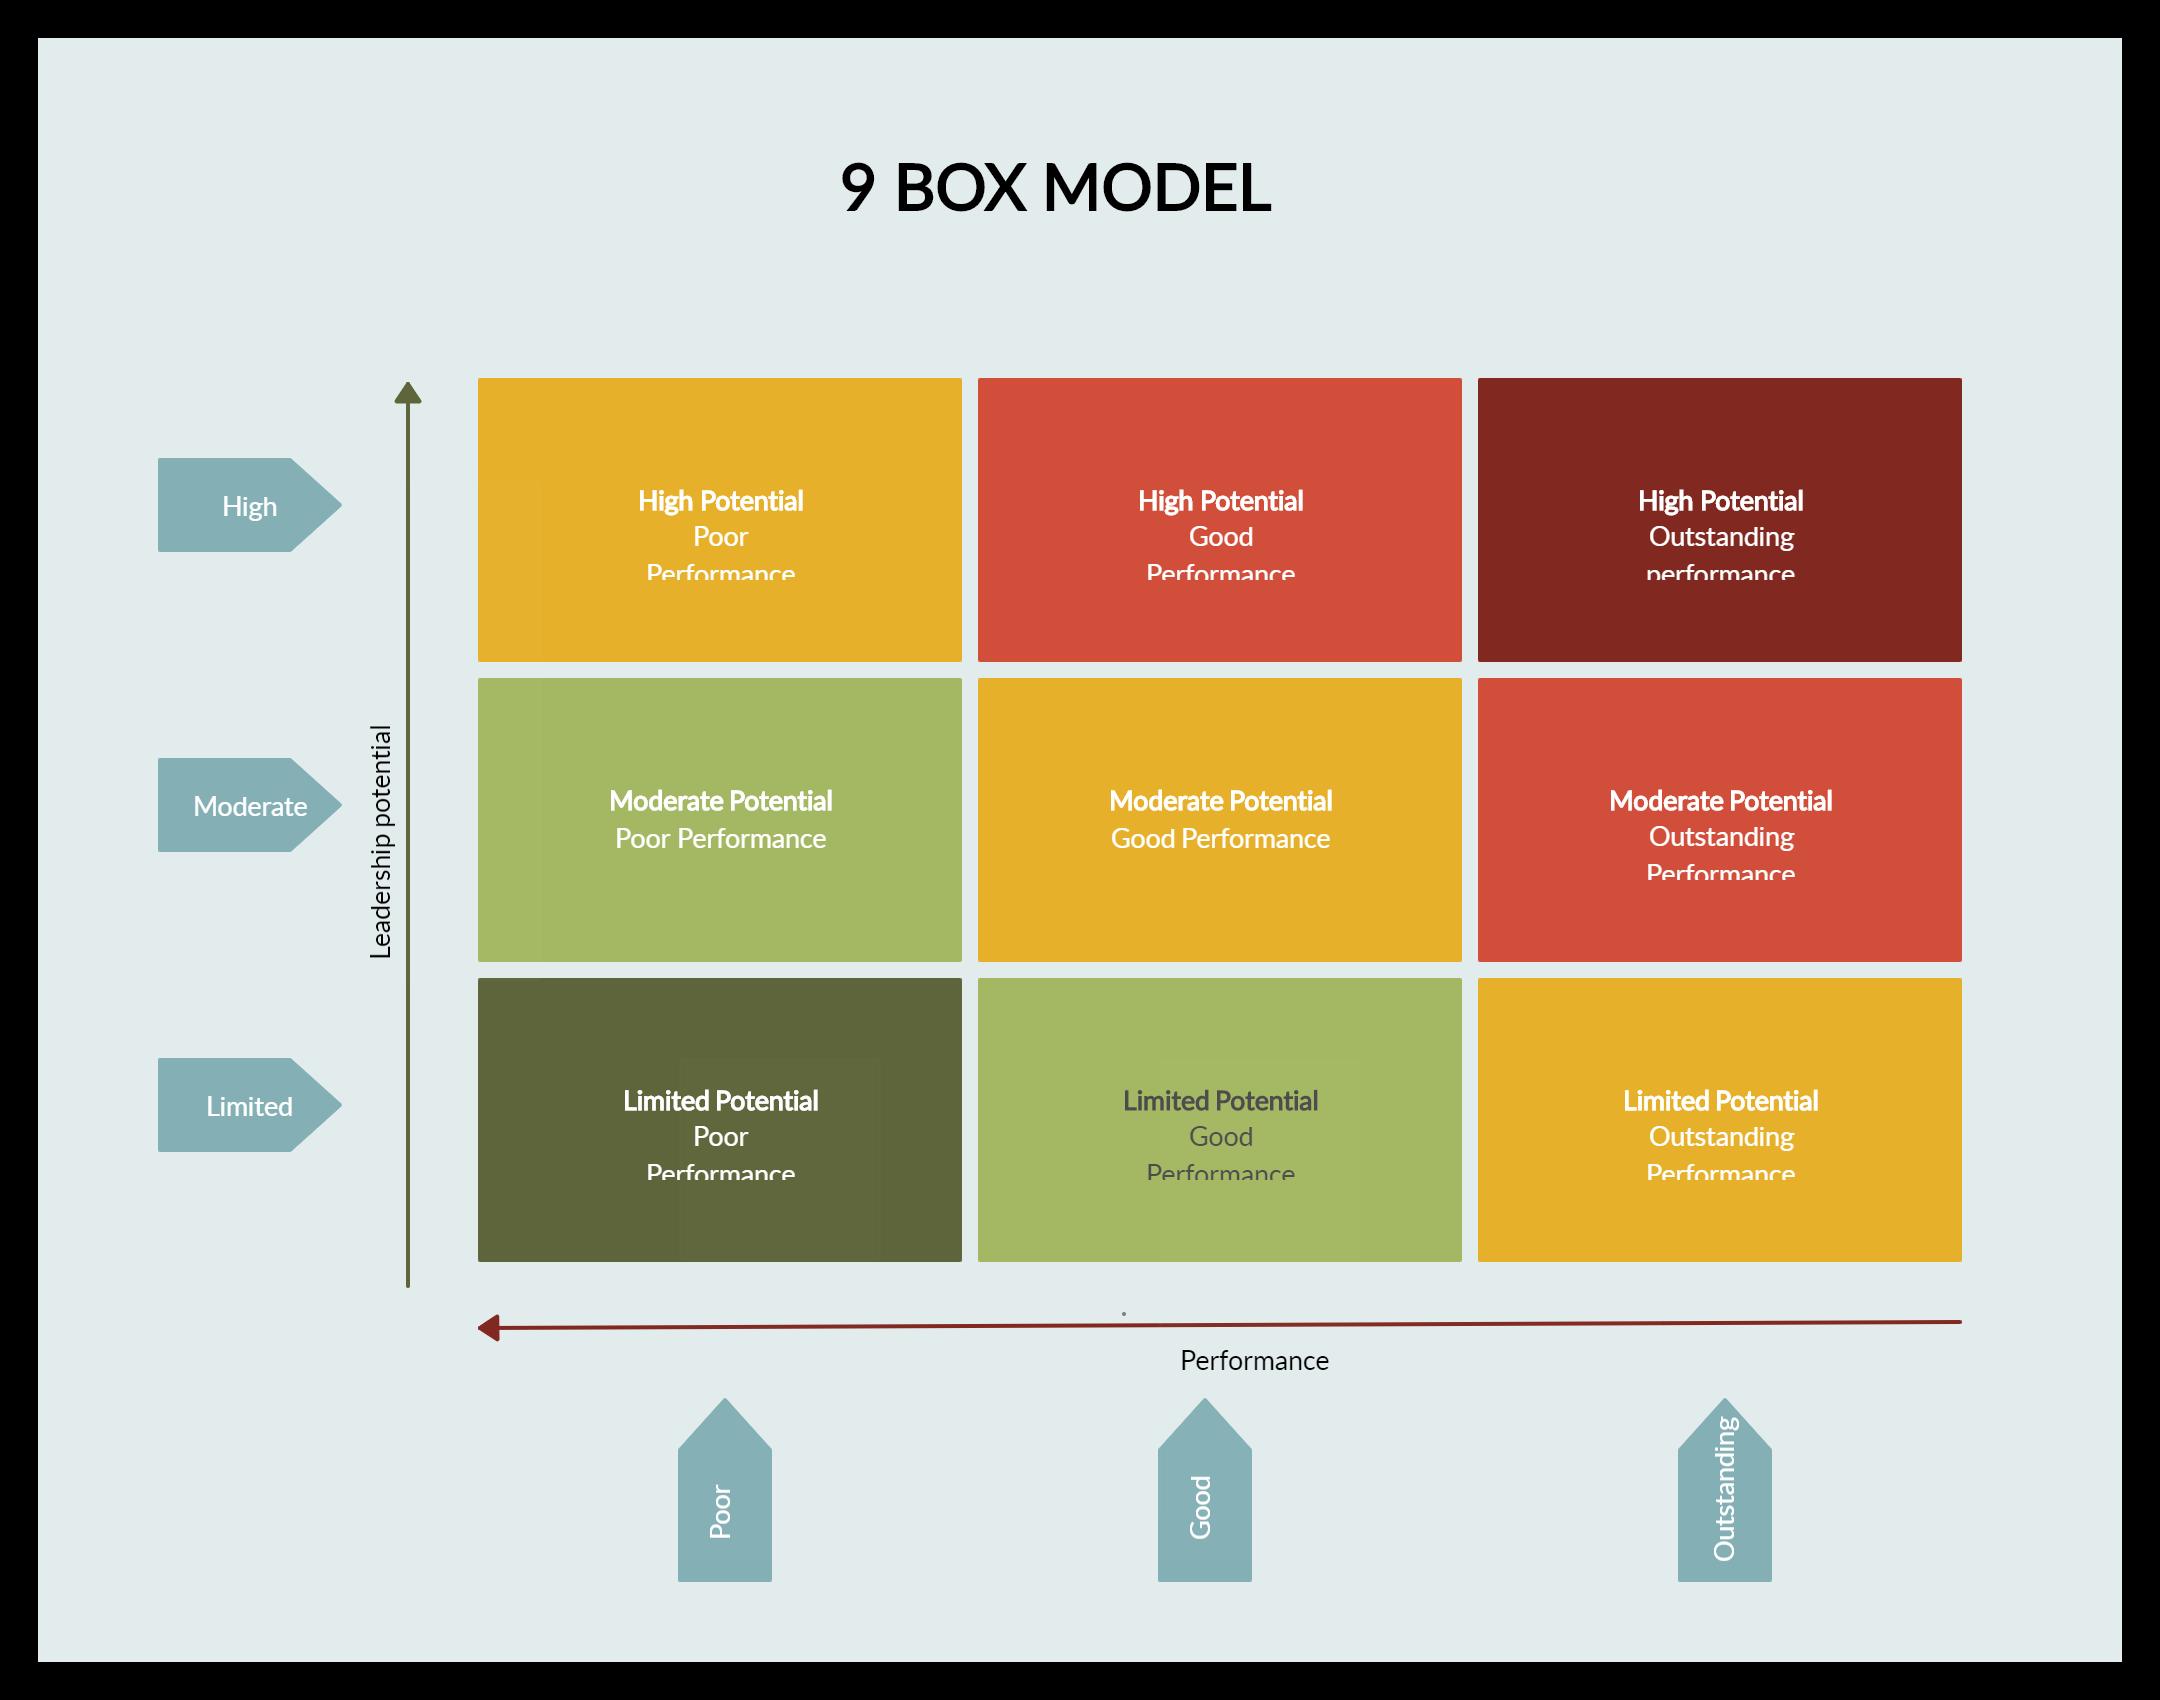 9 Box Model   Succession planning, Diagram, Organizational chartPinterest